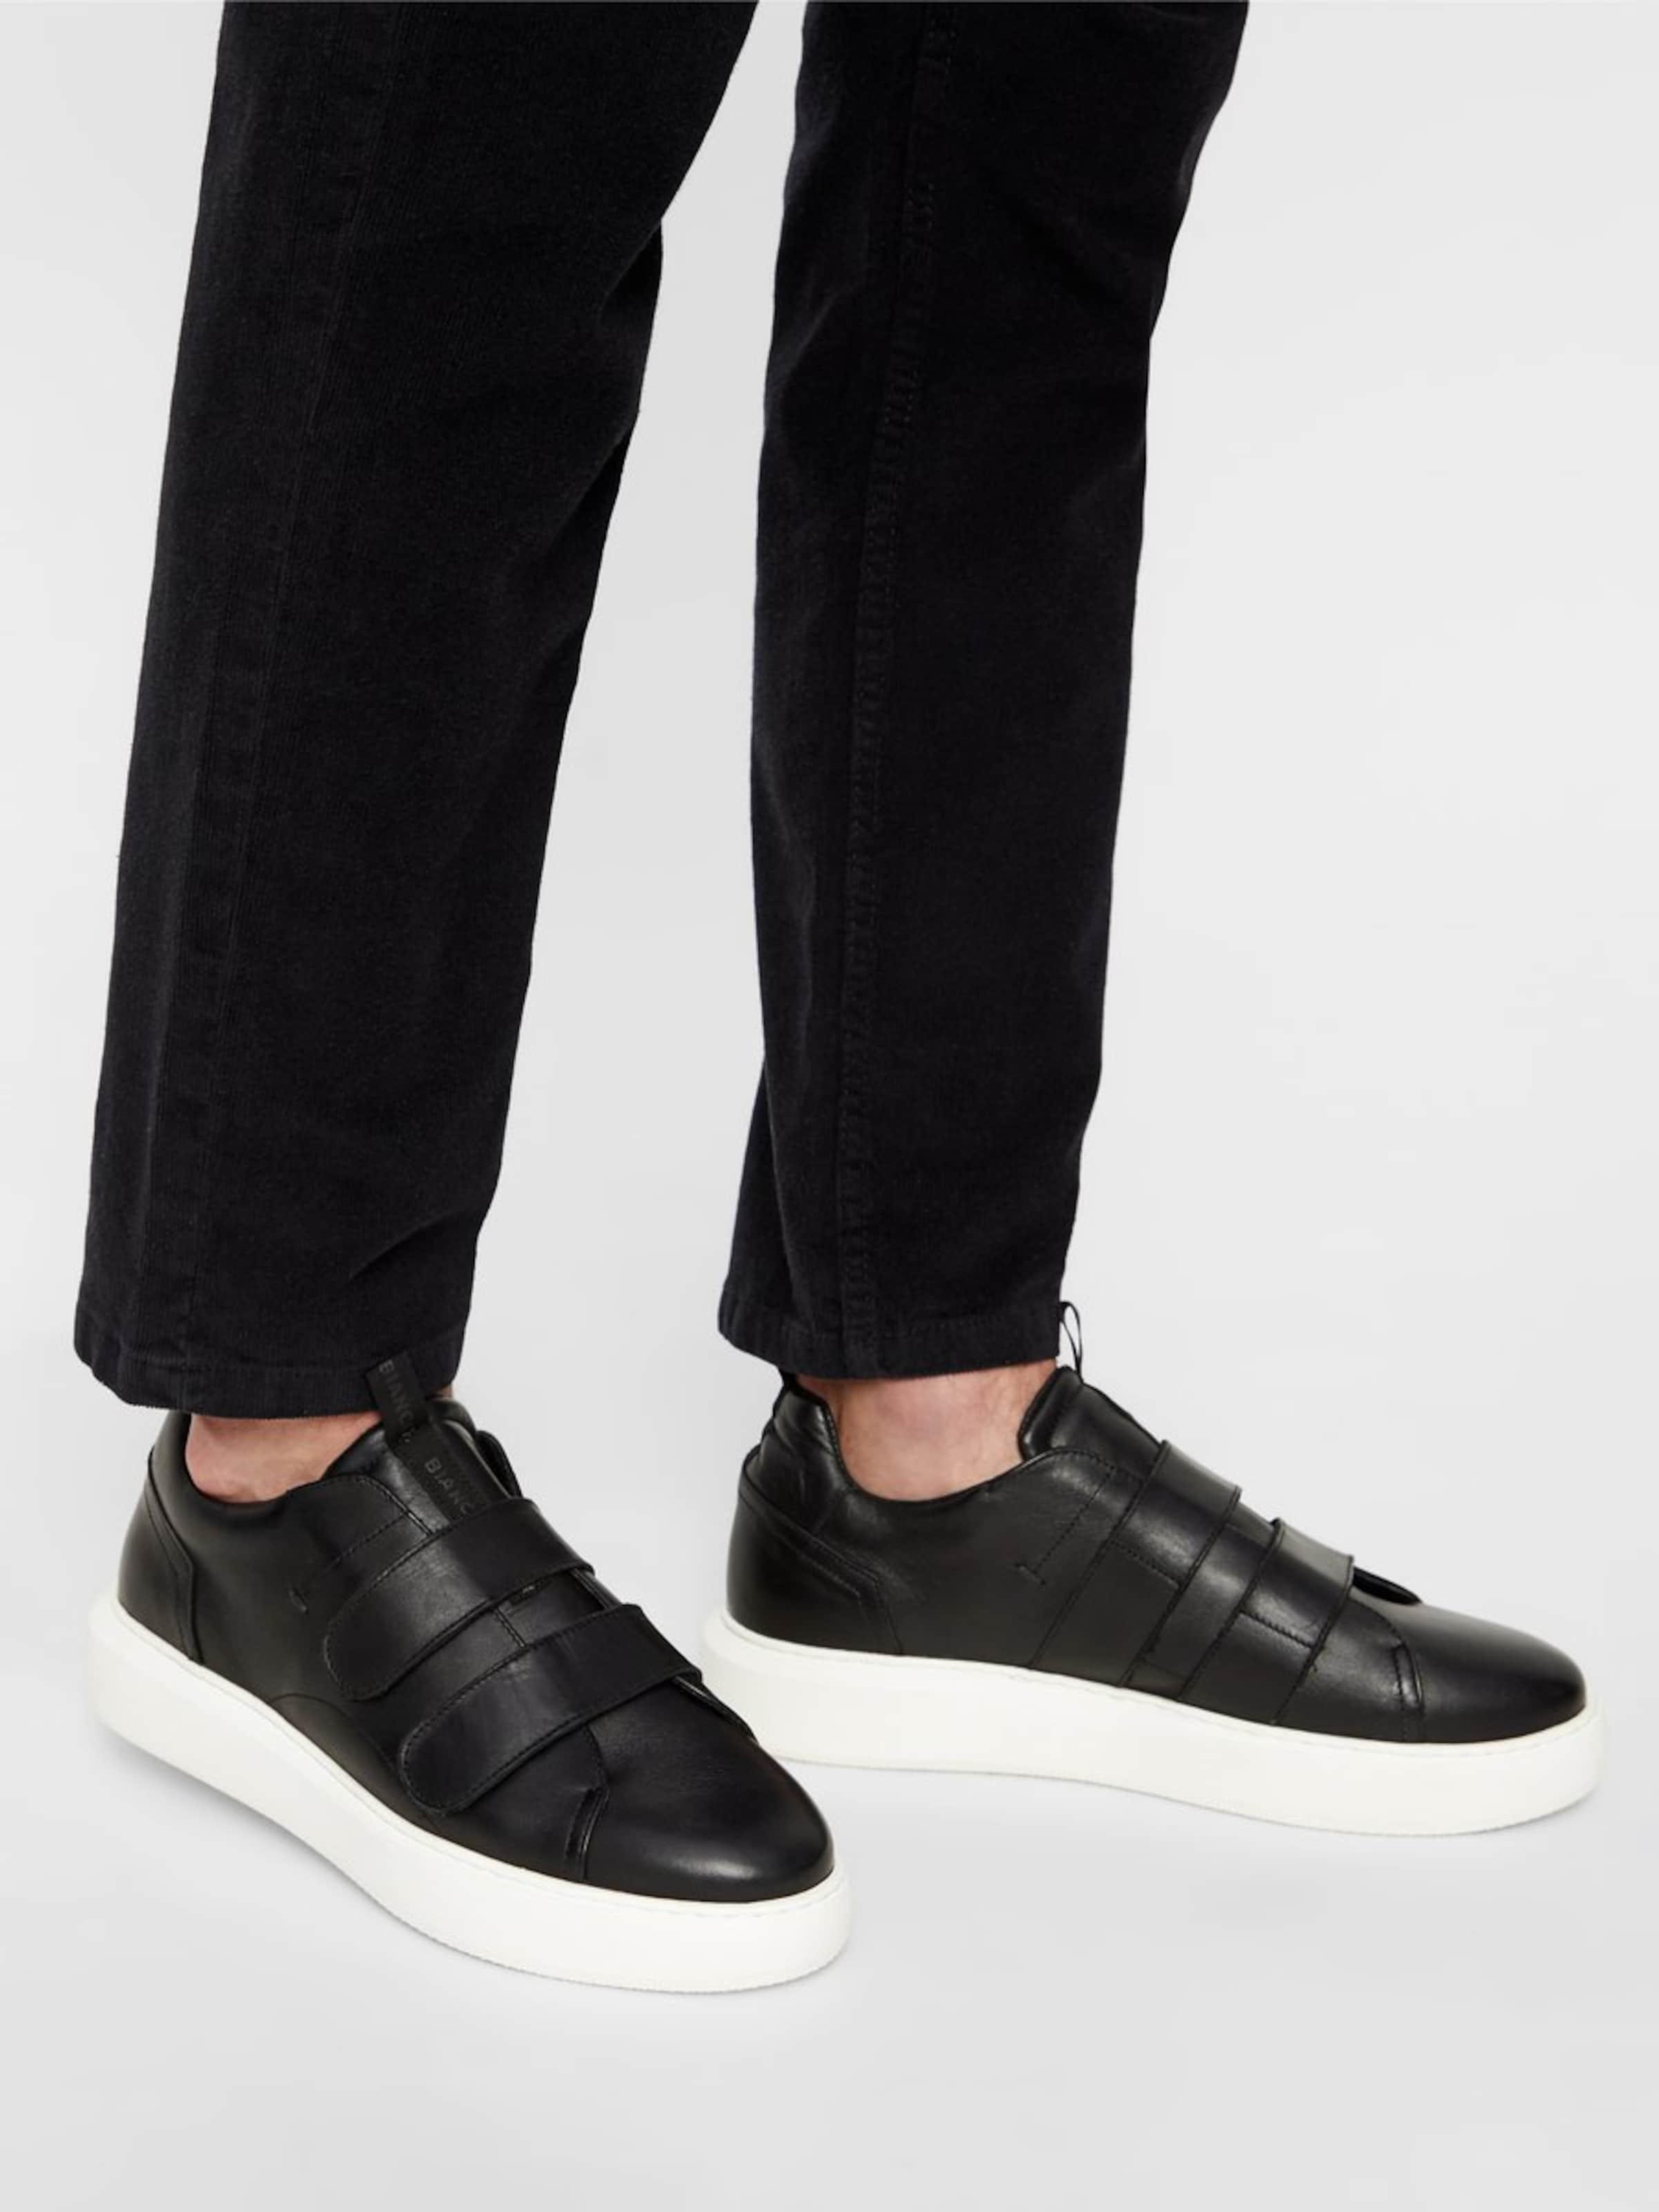 Bianco In Sneaker Bianco In Schwarz In Schwarz Sneaker Bianco Schwarz Sneaker Y6ybgfv7